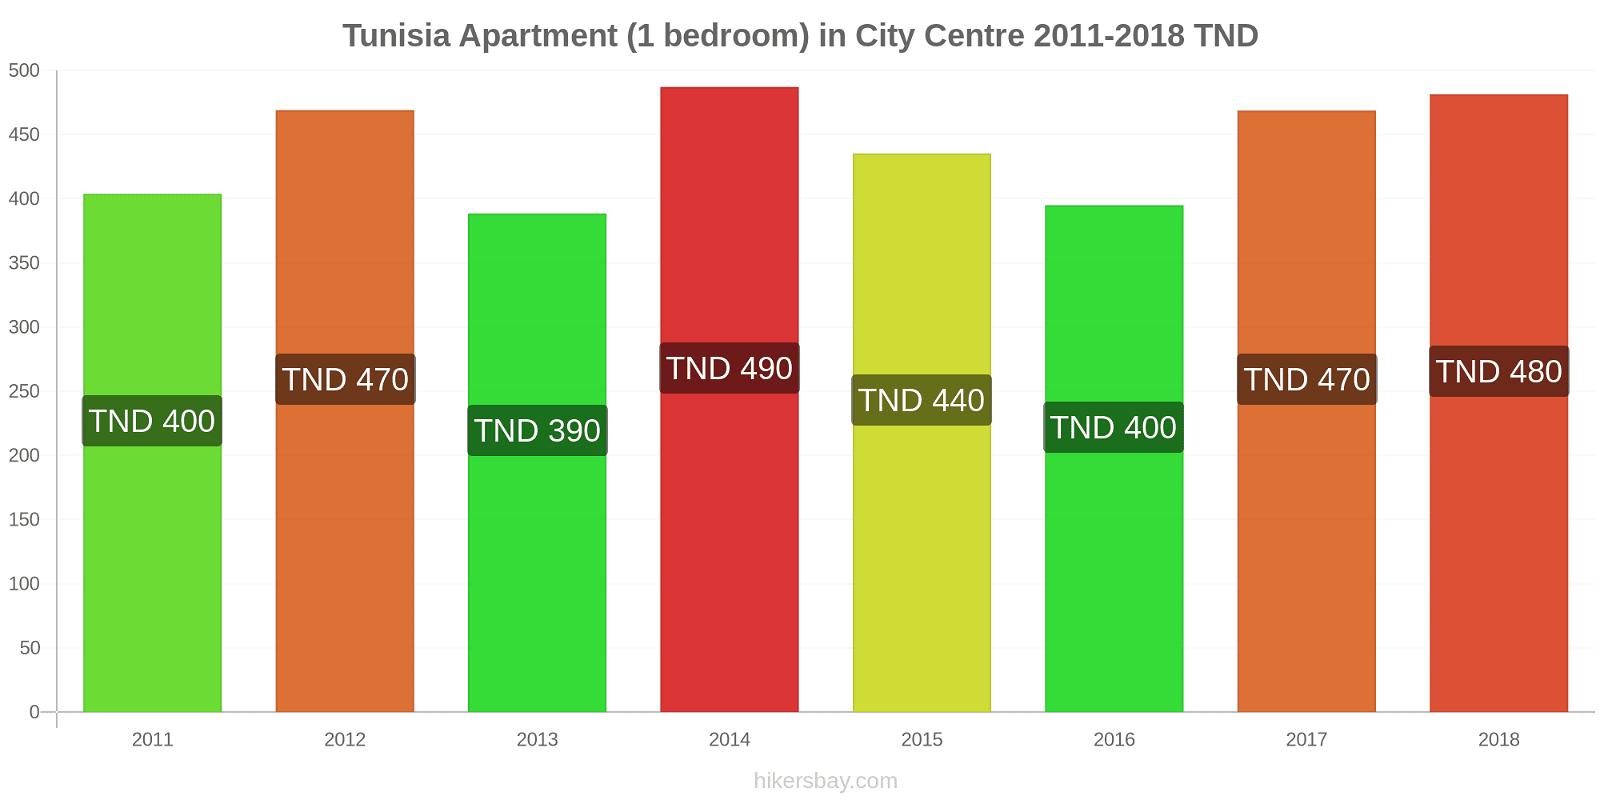 Tunisia price changes Apartment (1 bedroom) in City Centre hikersbay.com